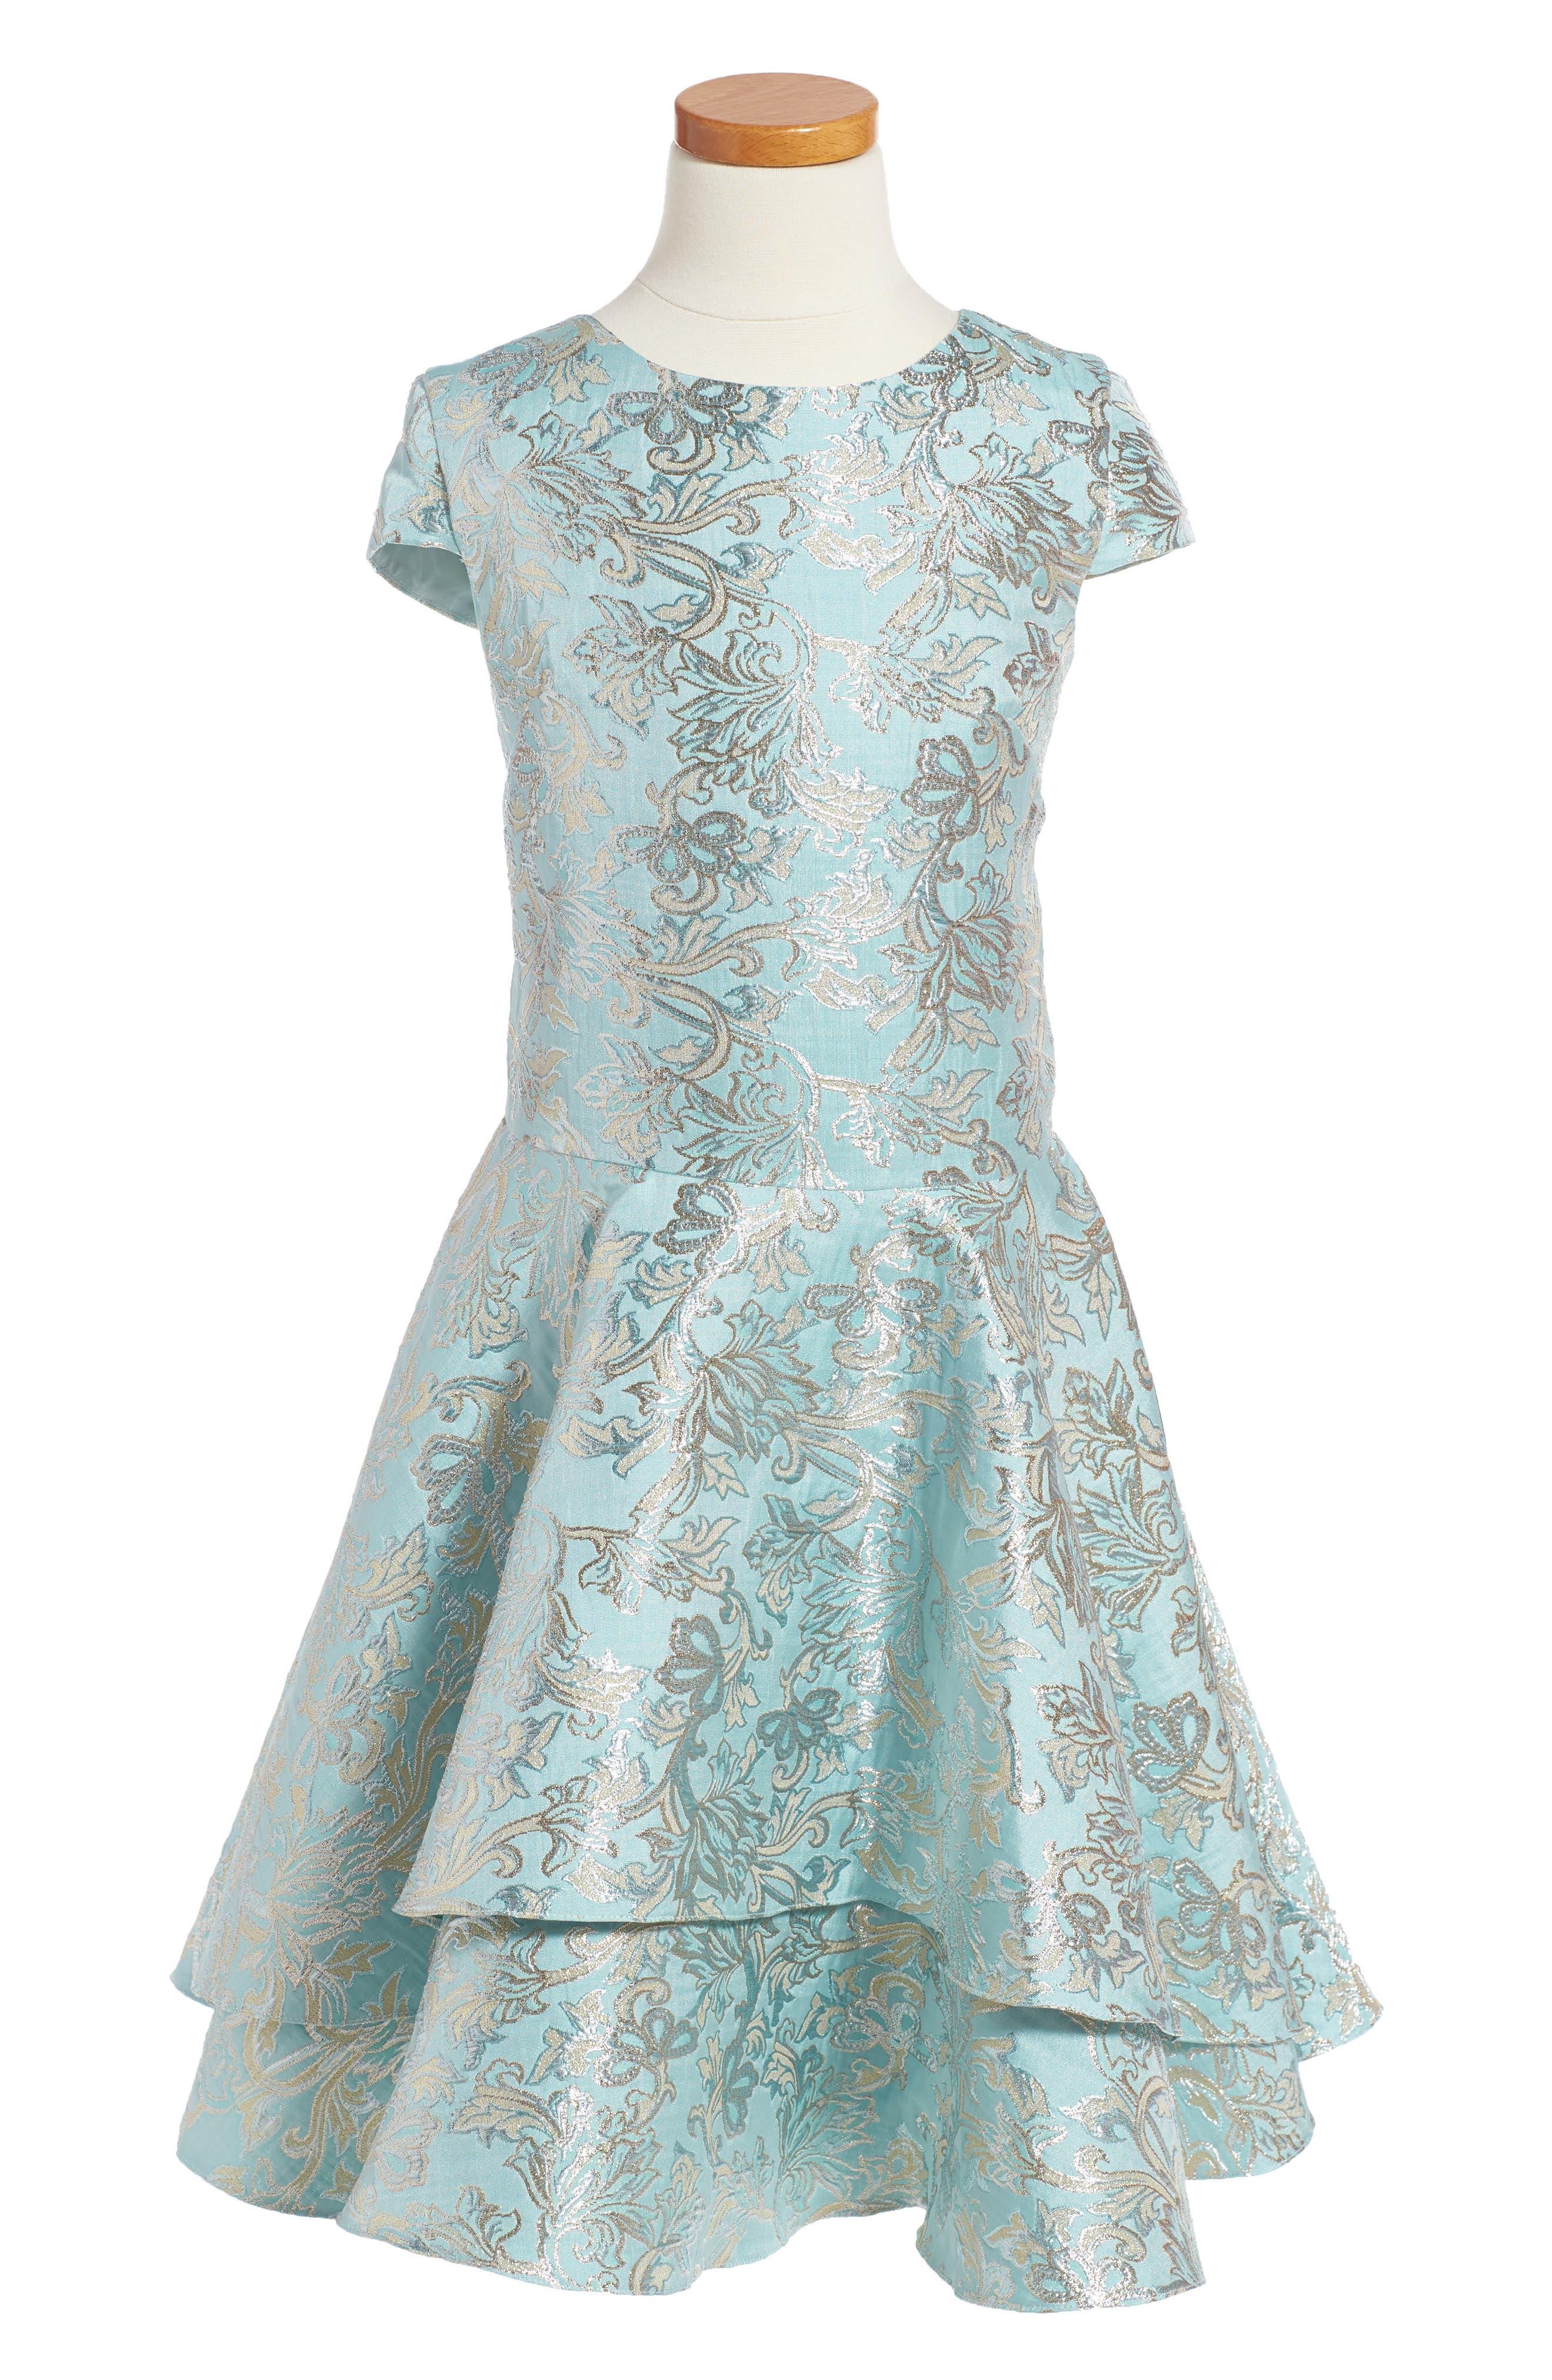 Floral Brocade Dress,                             Main thumbnail 1, color,                             440